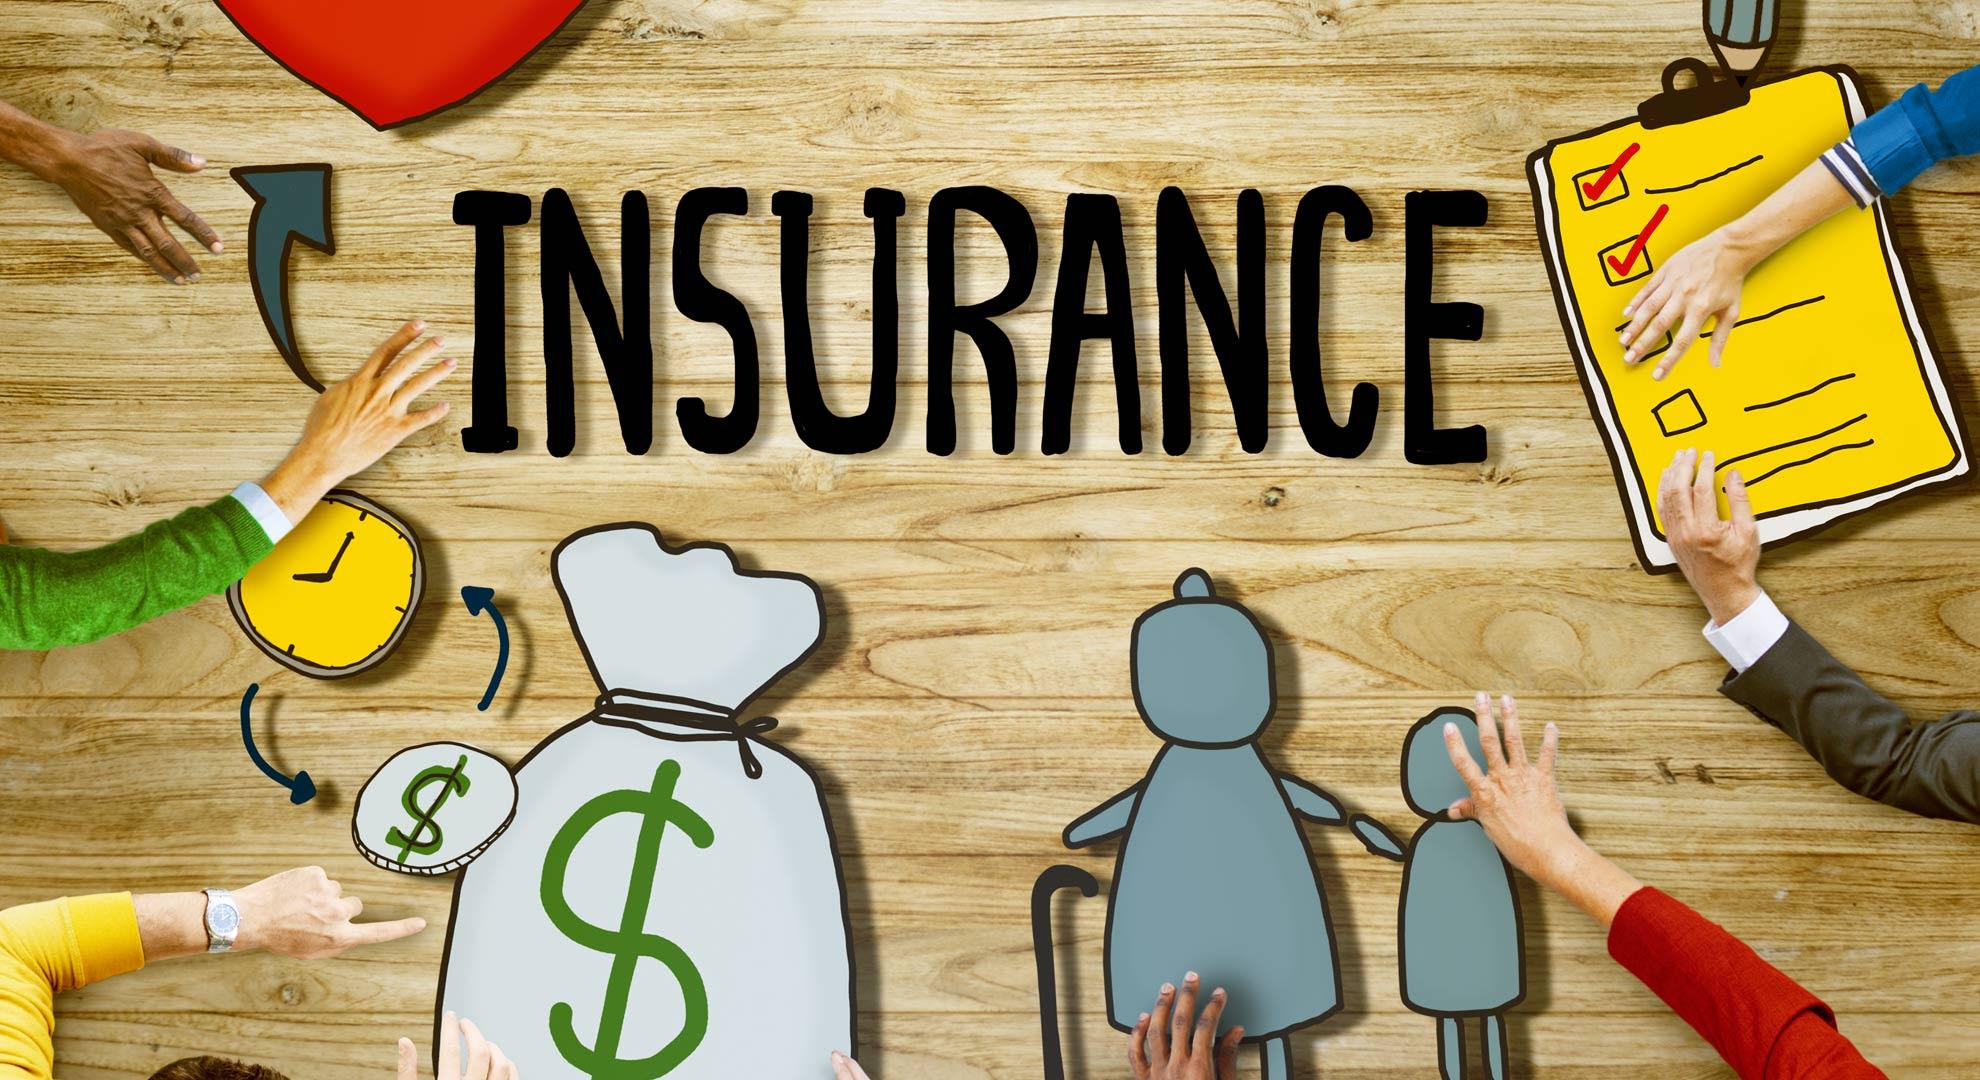 Article : Social Media - A Game Changer in Insurance BPO